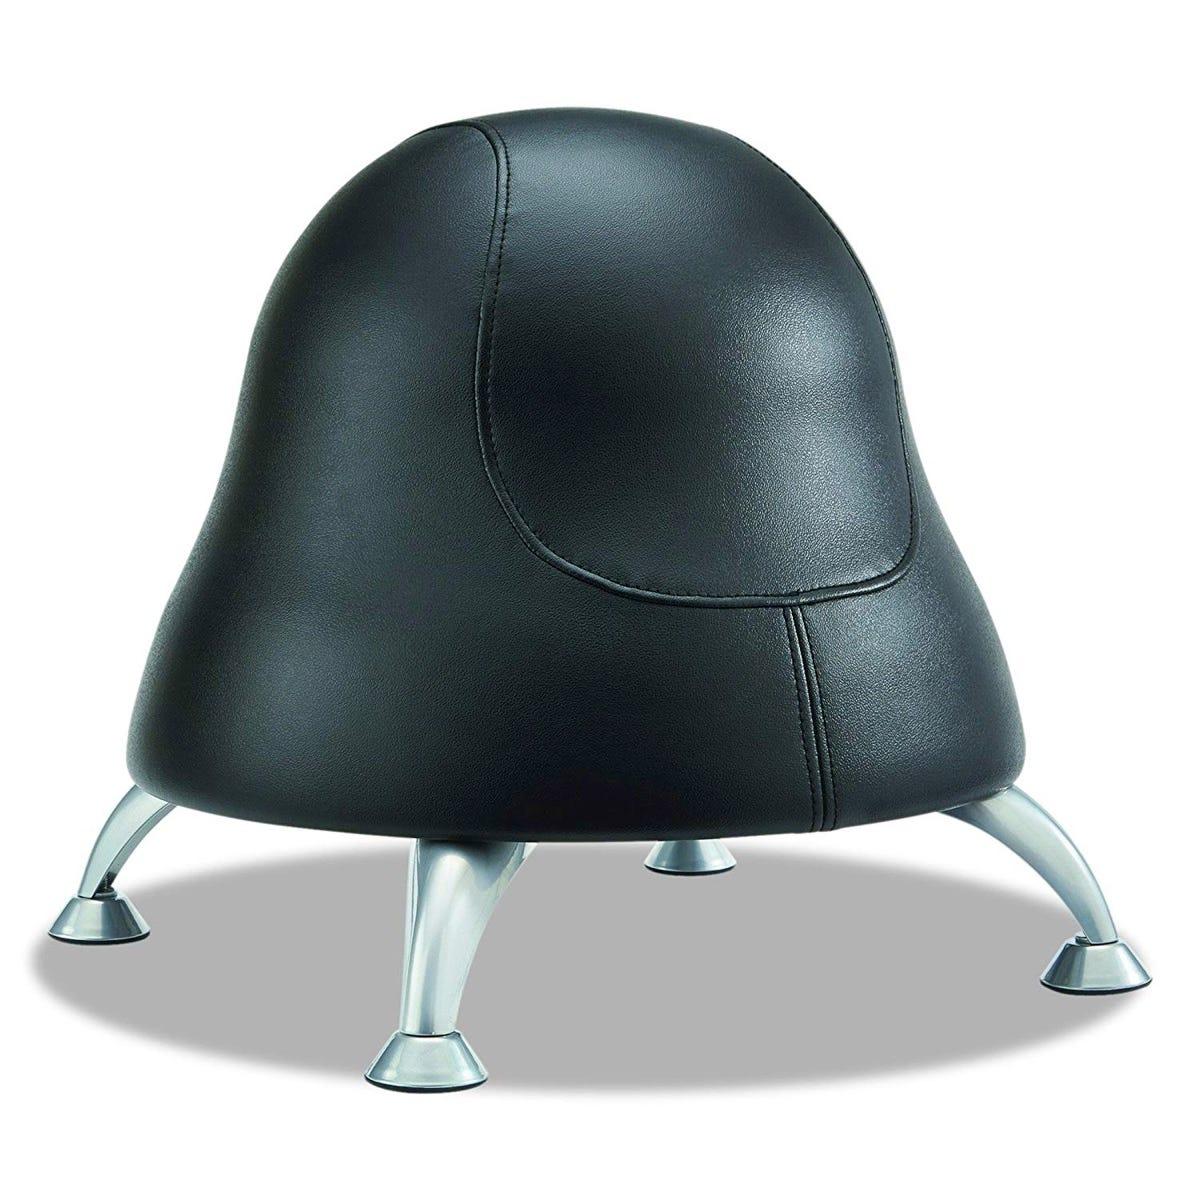 Runtz Black Vinyl Ball Chair